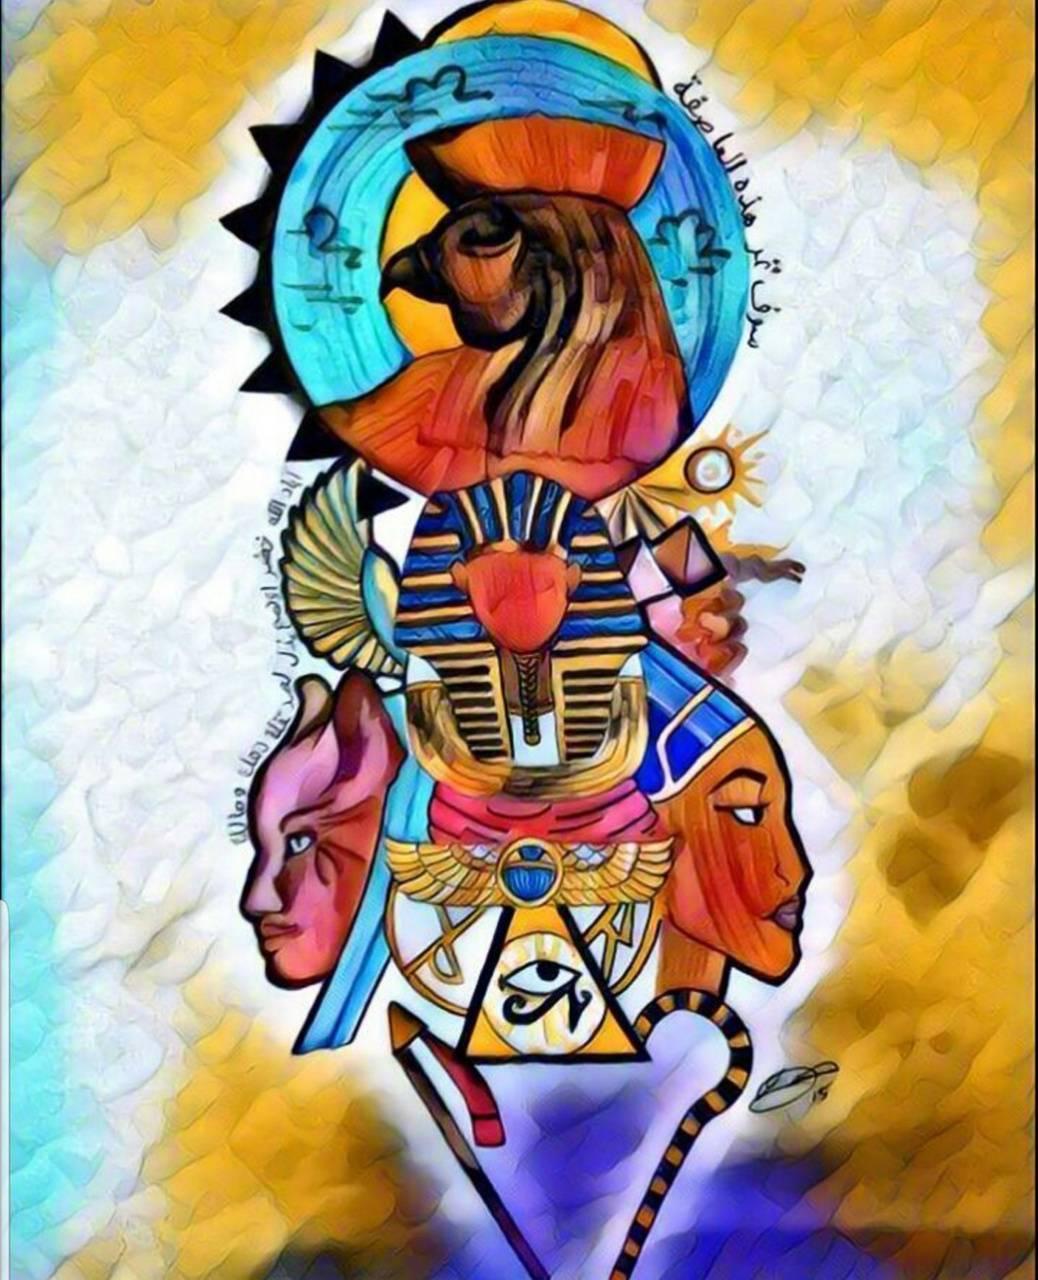 Egyptian Gods Wallpaper By Vdk272 Ee Free On Zedge